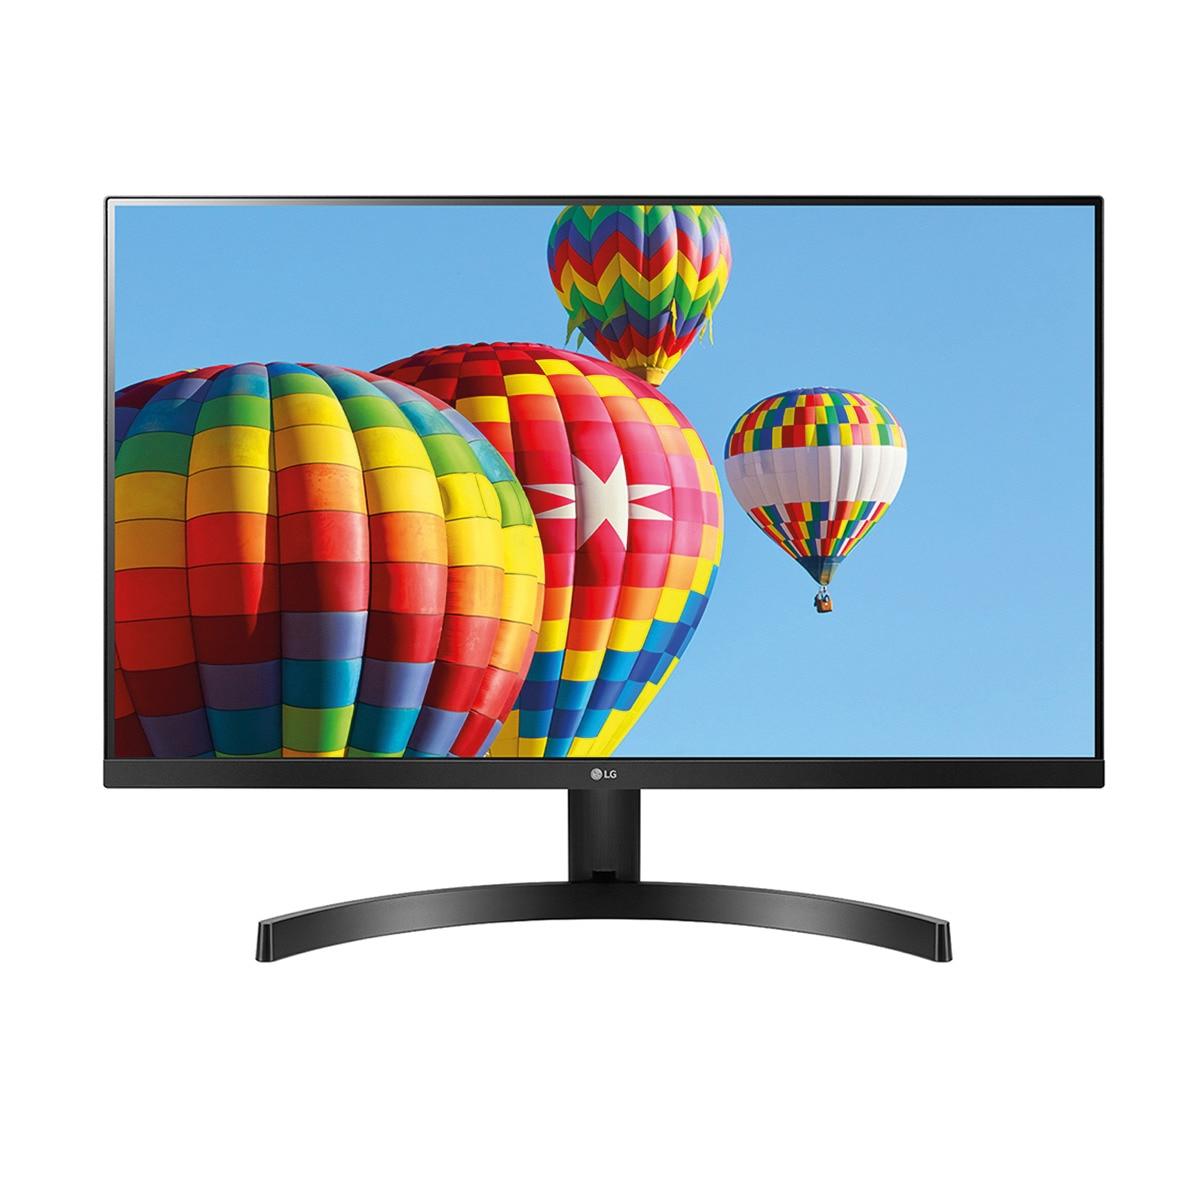 "Monitor 27"" LG 27MK600M Full HD IPS, Radeon FreeSync"